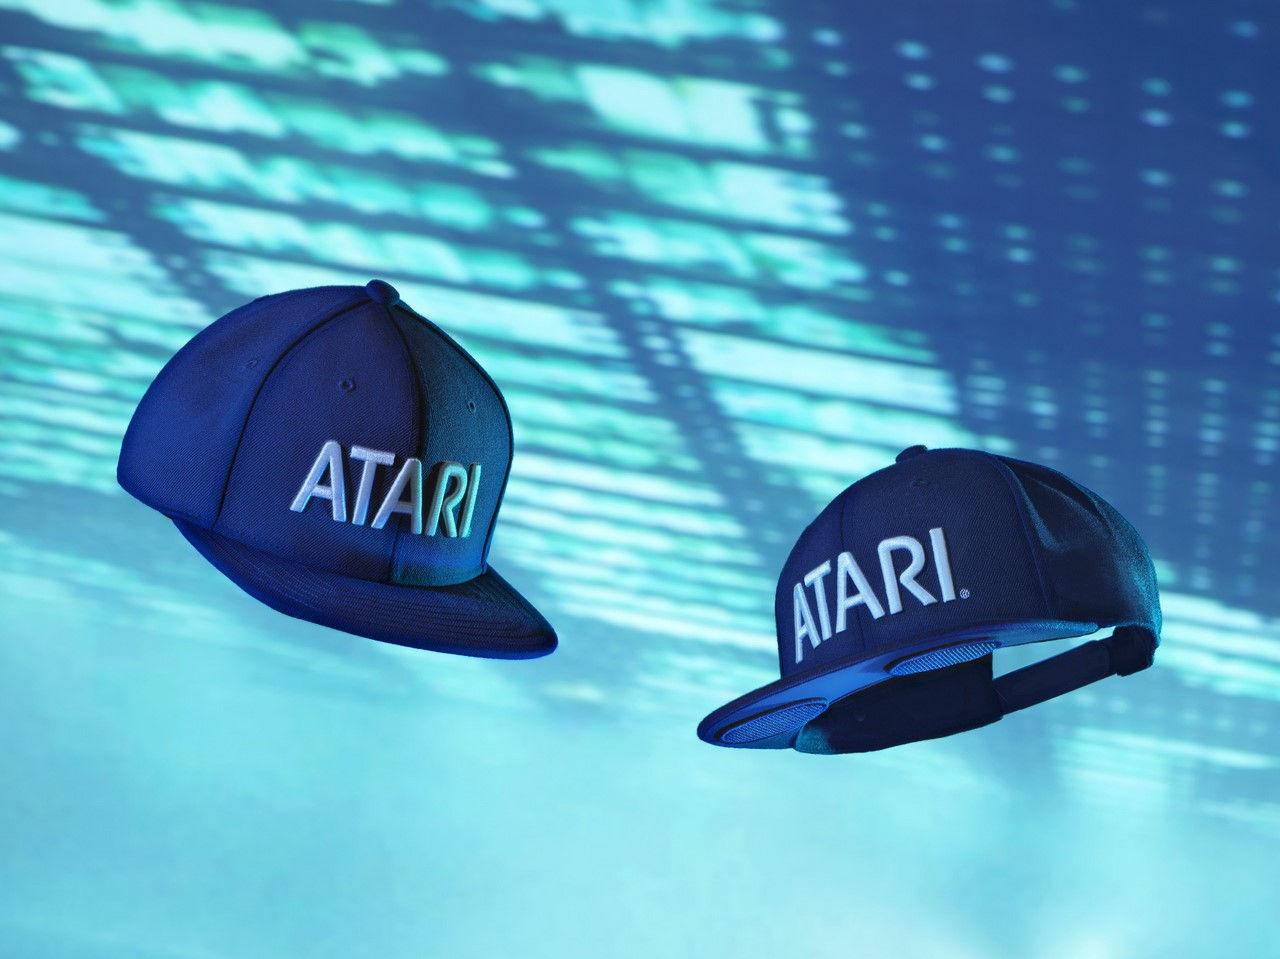 73249a0b8d38a1 Atari Speakerhat is somehow both genius and ridiculous - SlashGear